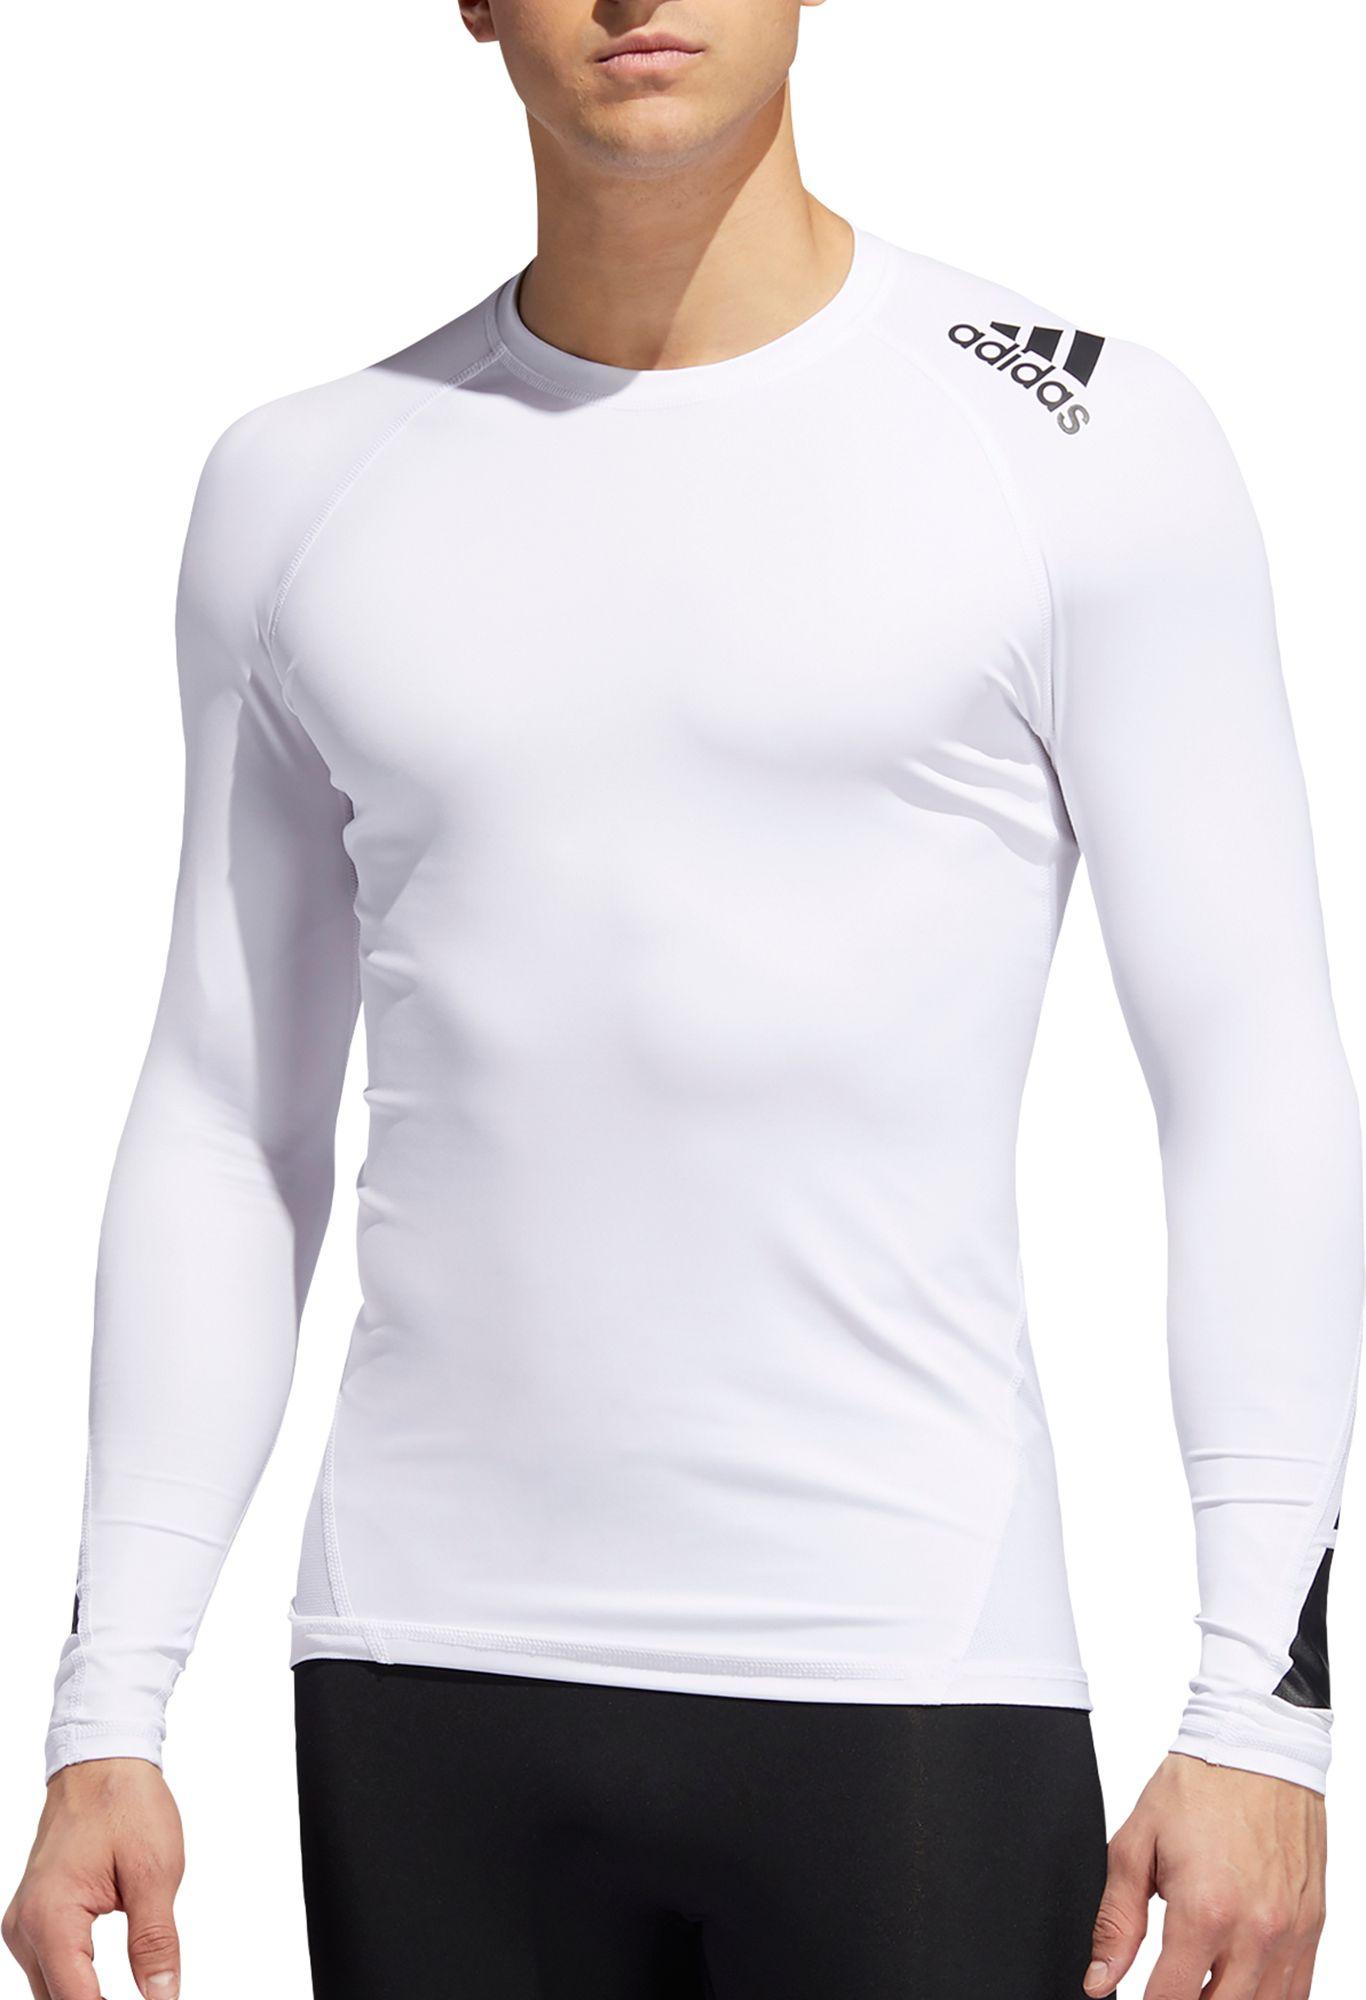 adidas long sleeve t shirt mens